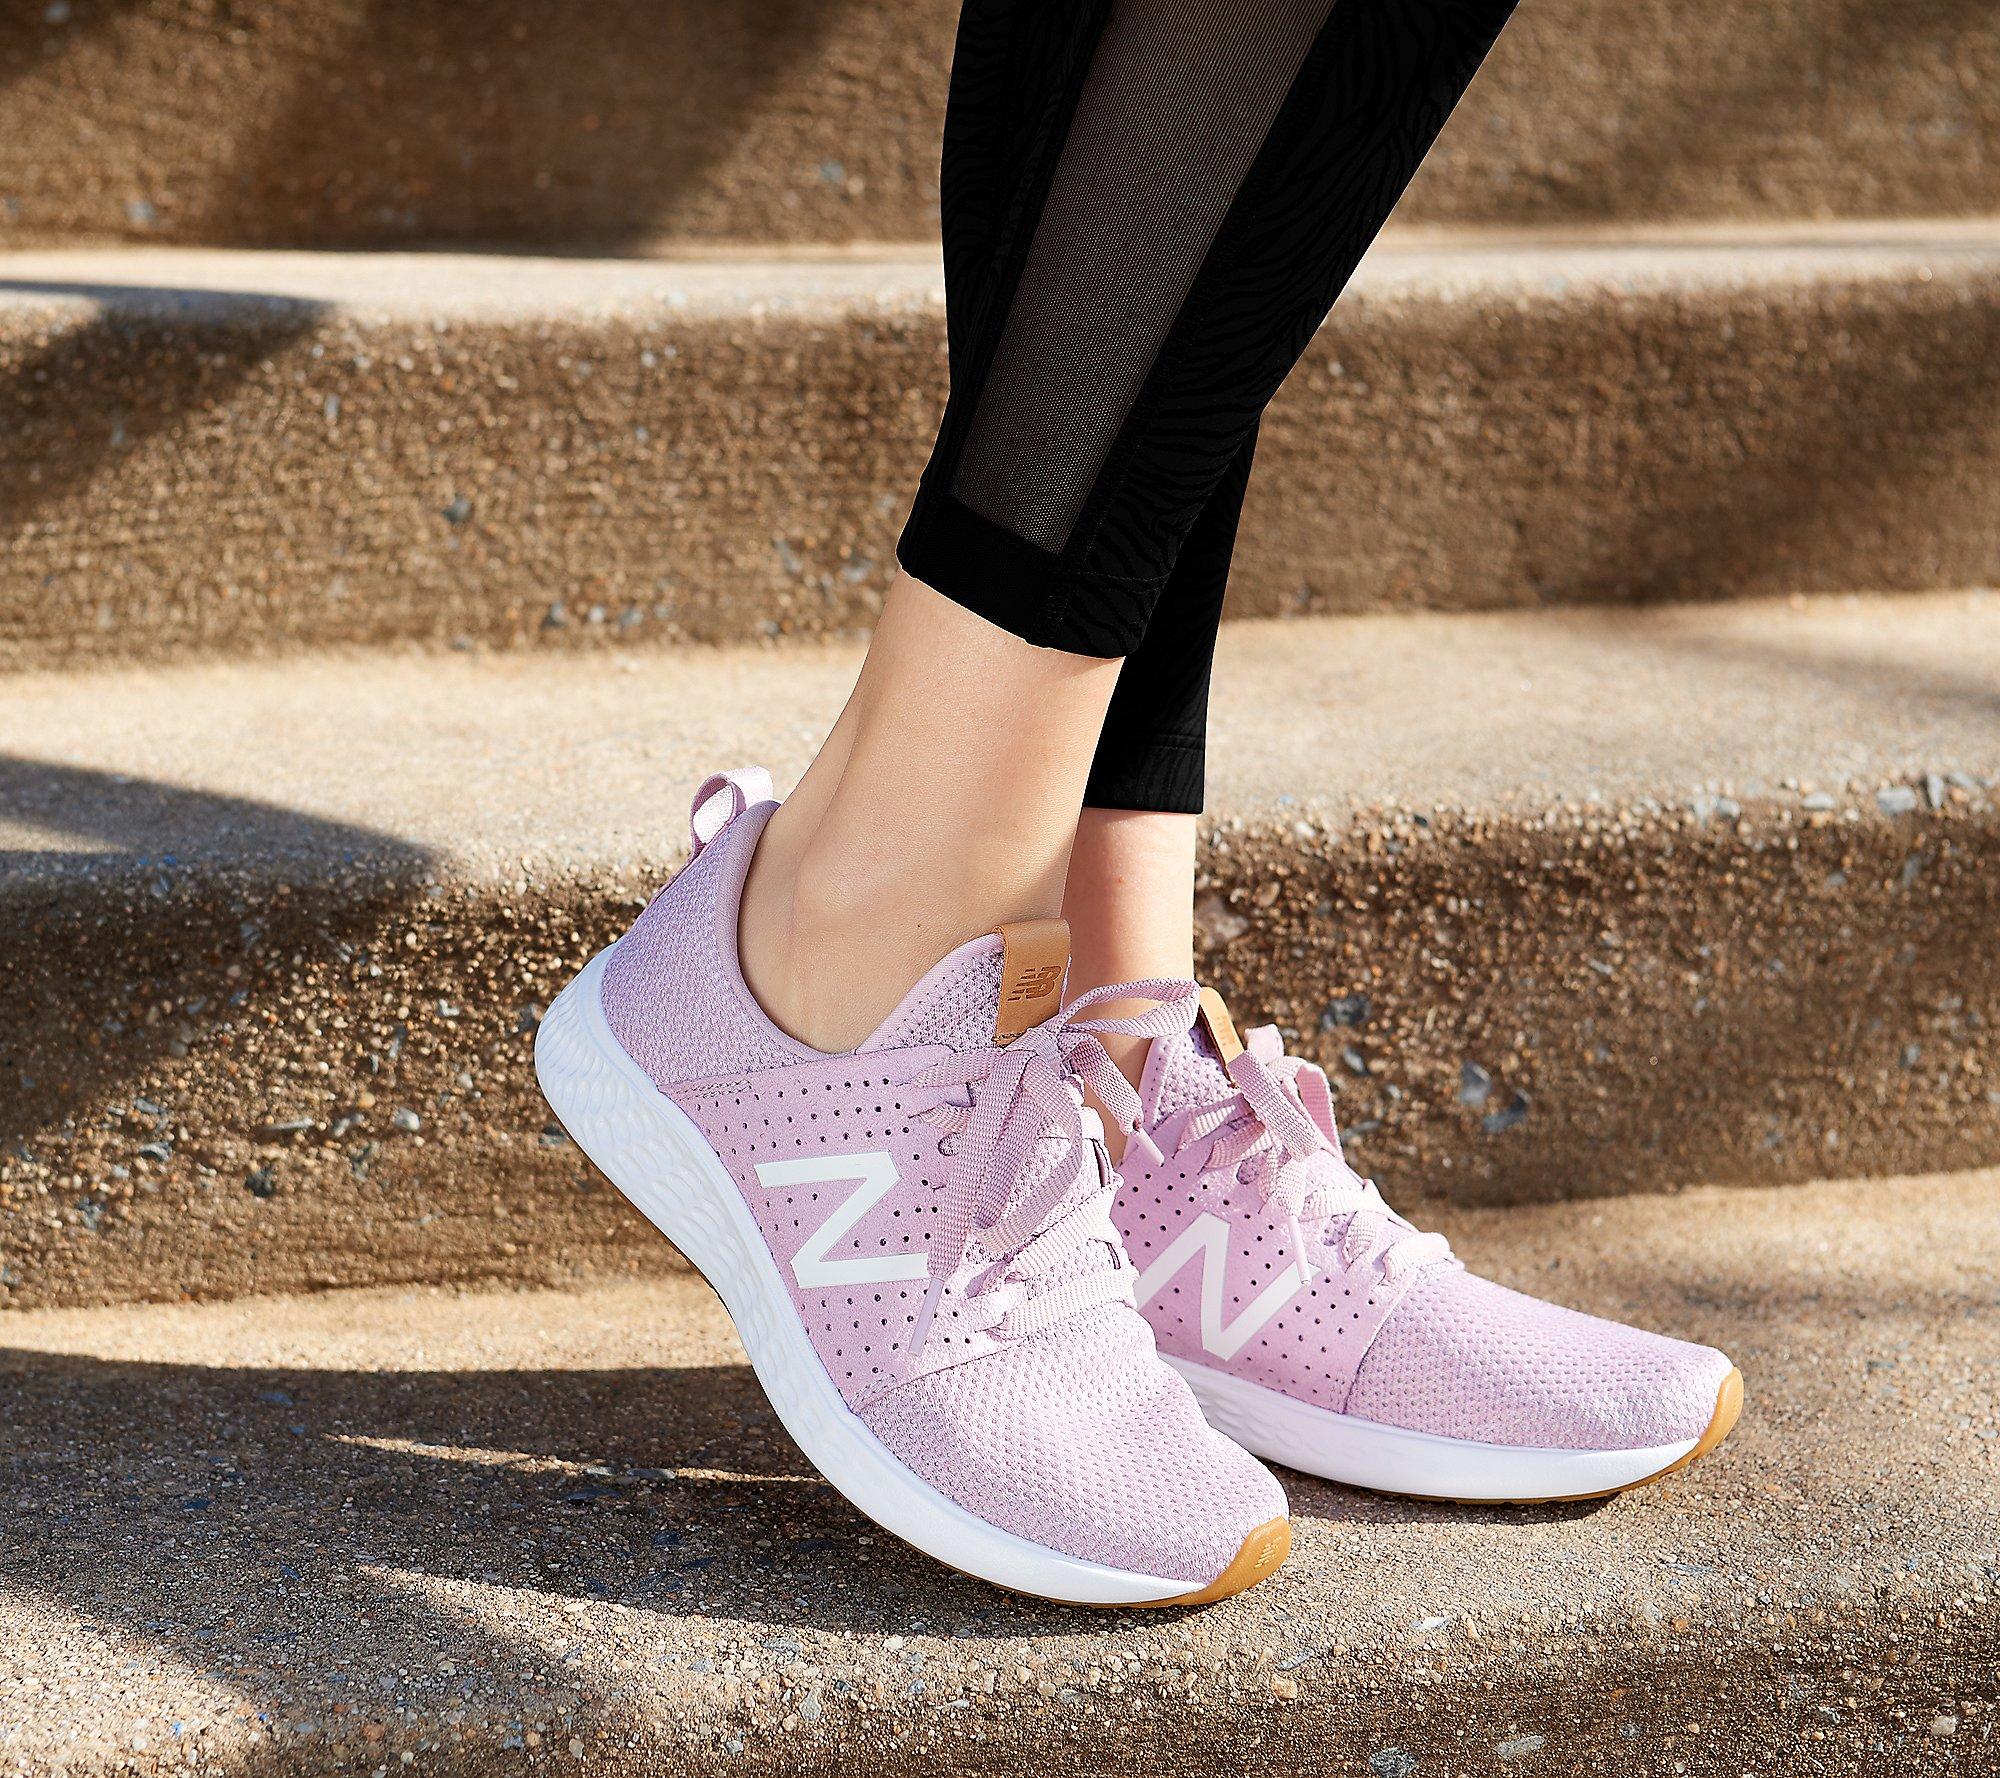 New Balance Lace-Up Sneakers – Fresh Foam Sport $29.65